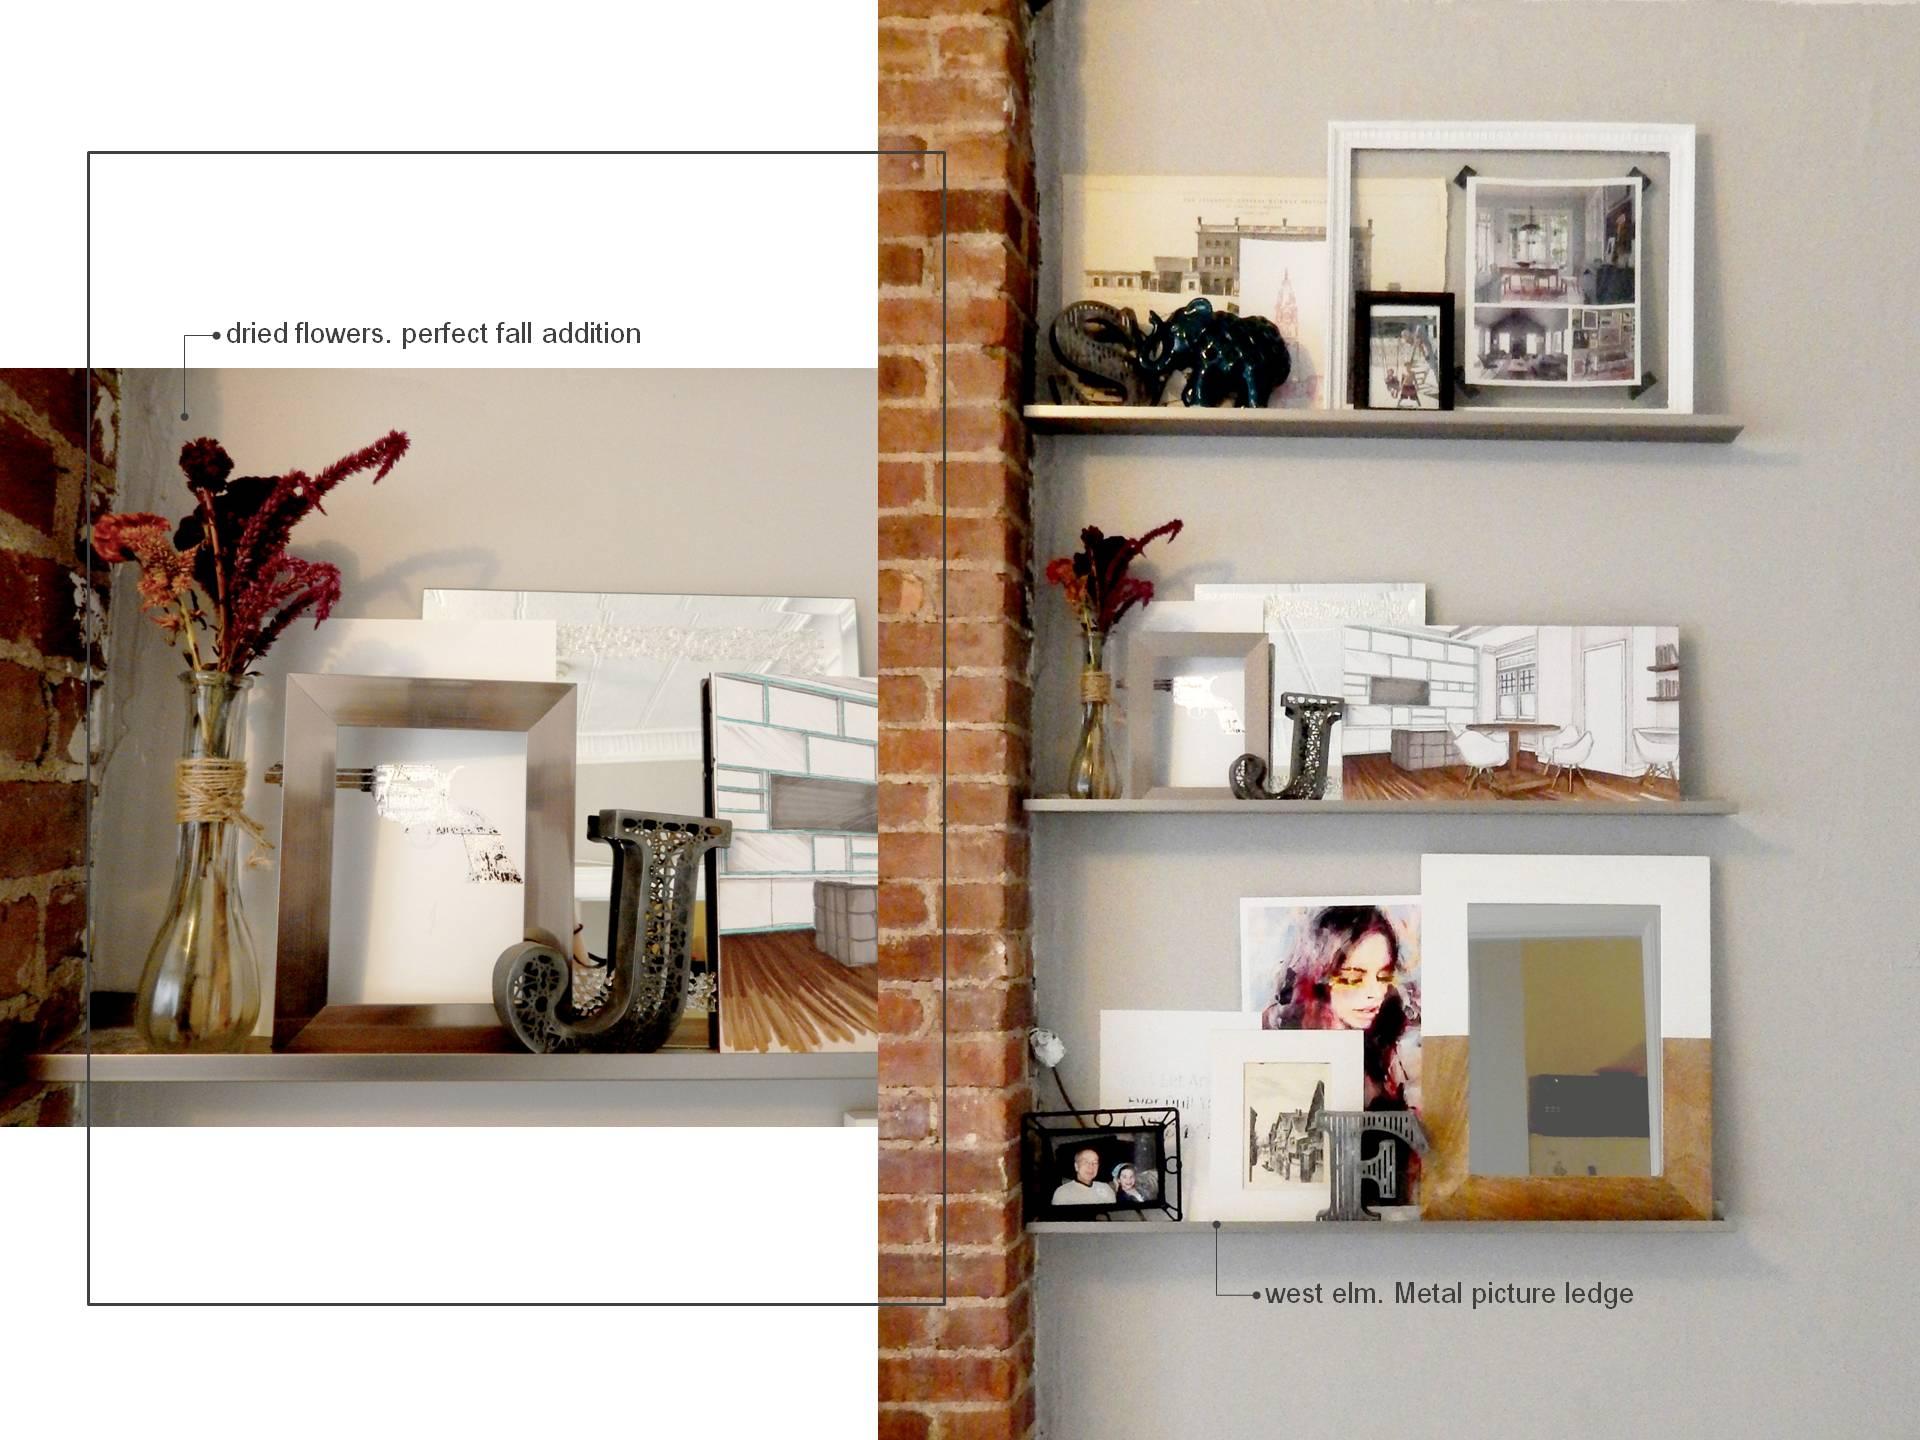 apartment pieces. living room shelves. color me quirky